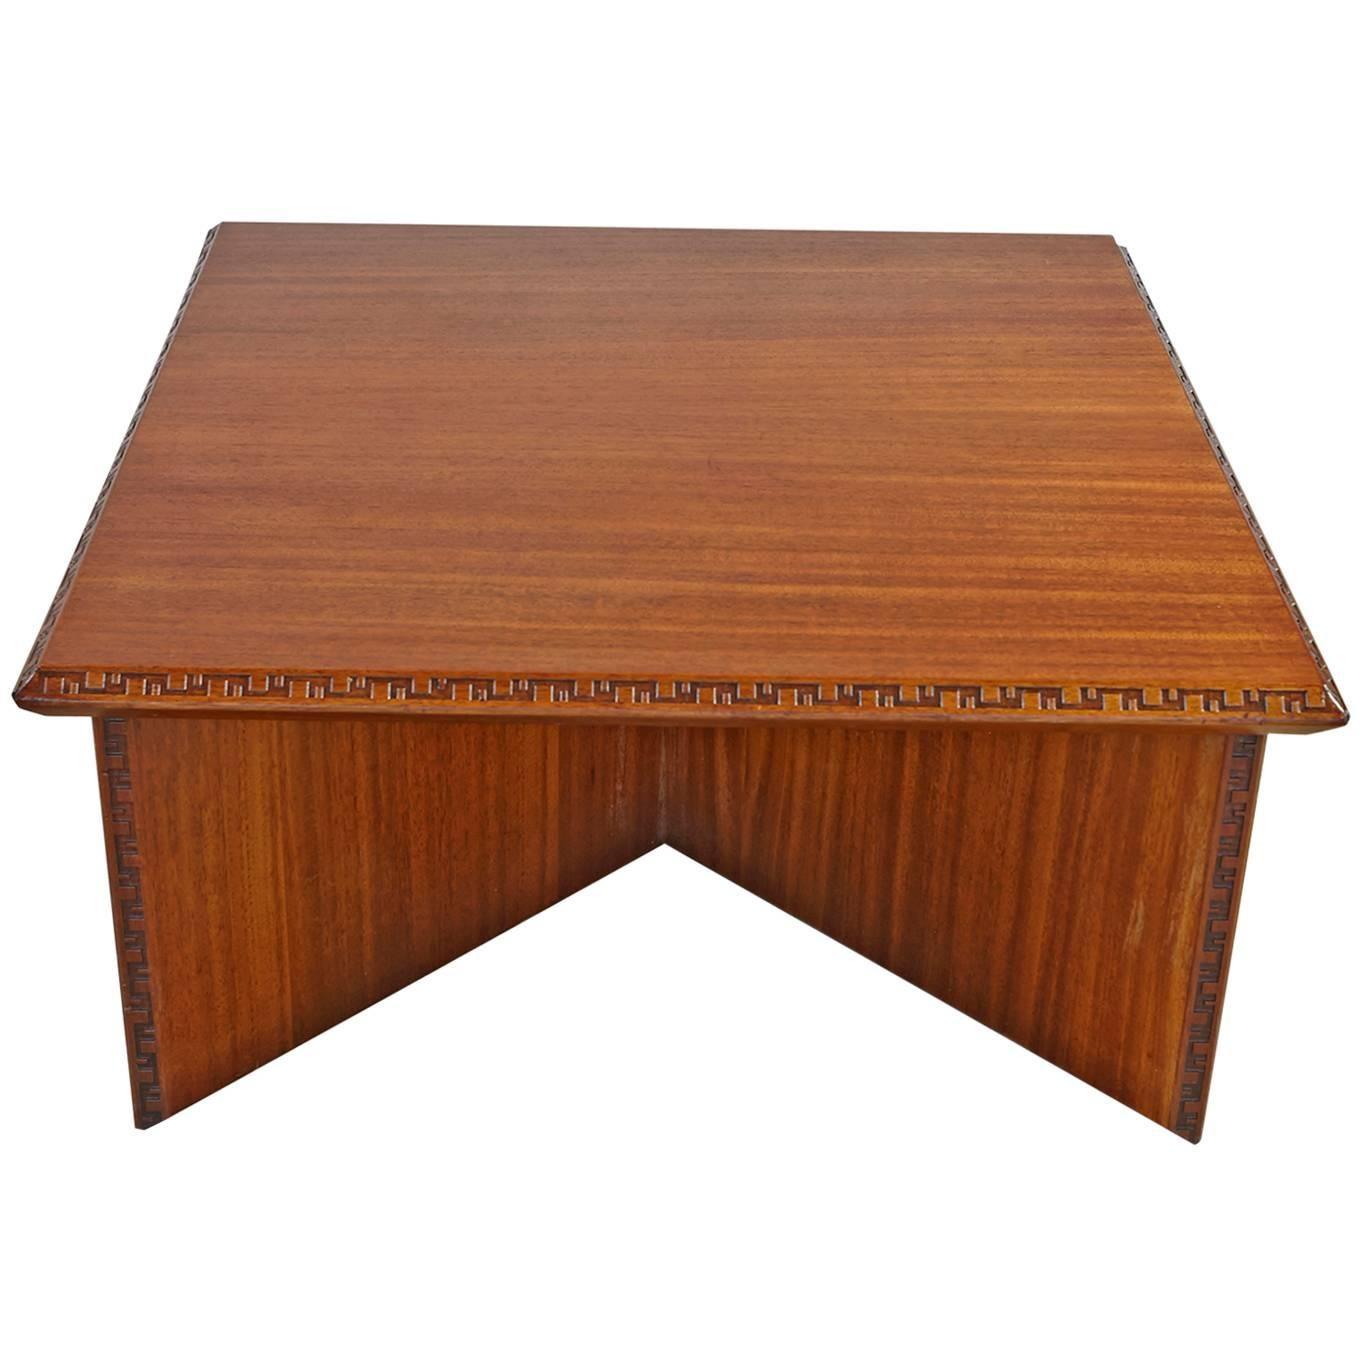 Frank Loyd Wright Coffee Table for Heritage Henredon